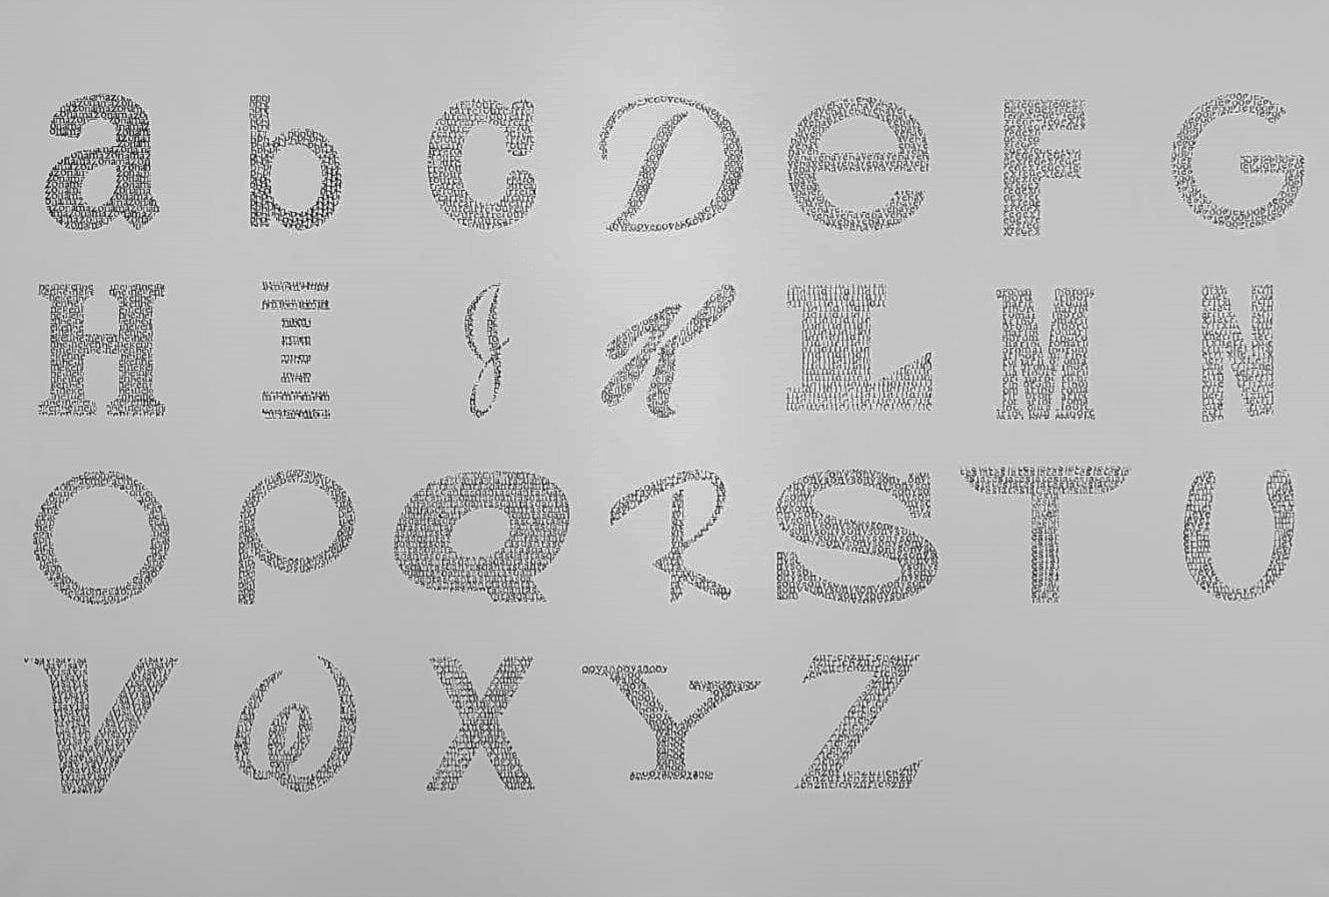 Universal Alphabet 2